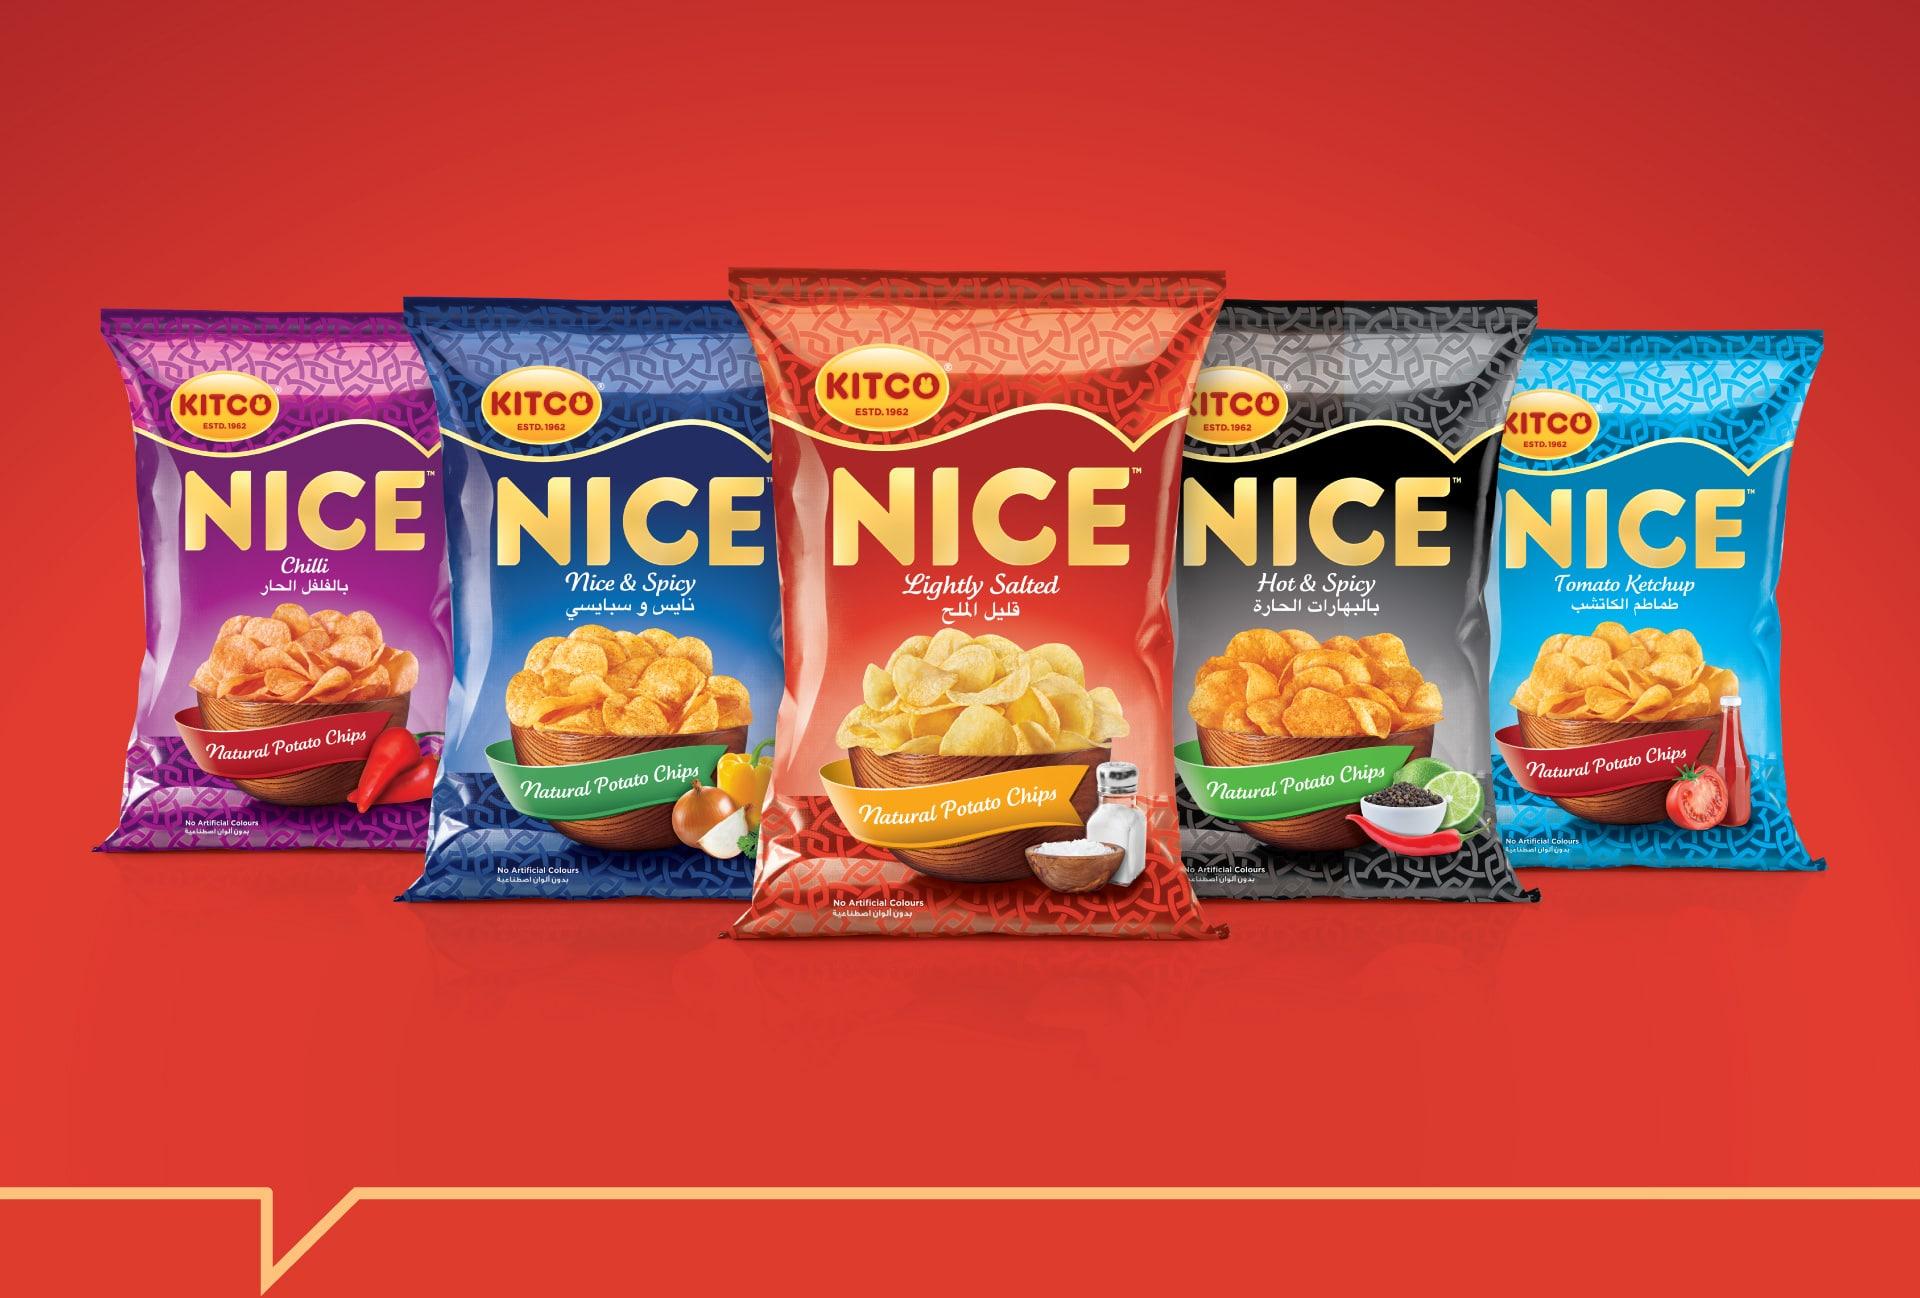 Kitco Nice - Brand Packaging Design